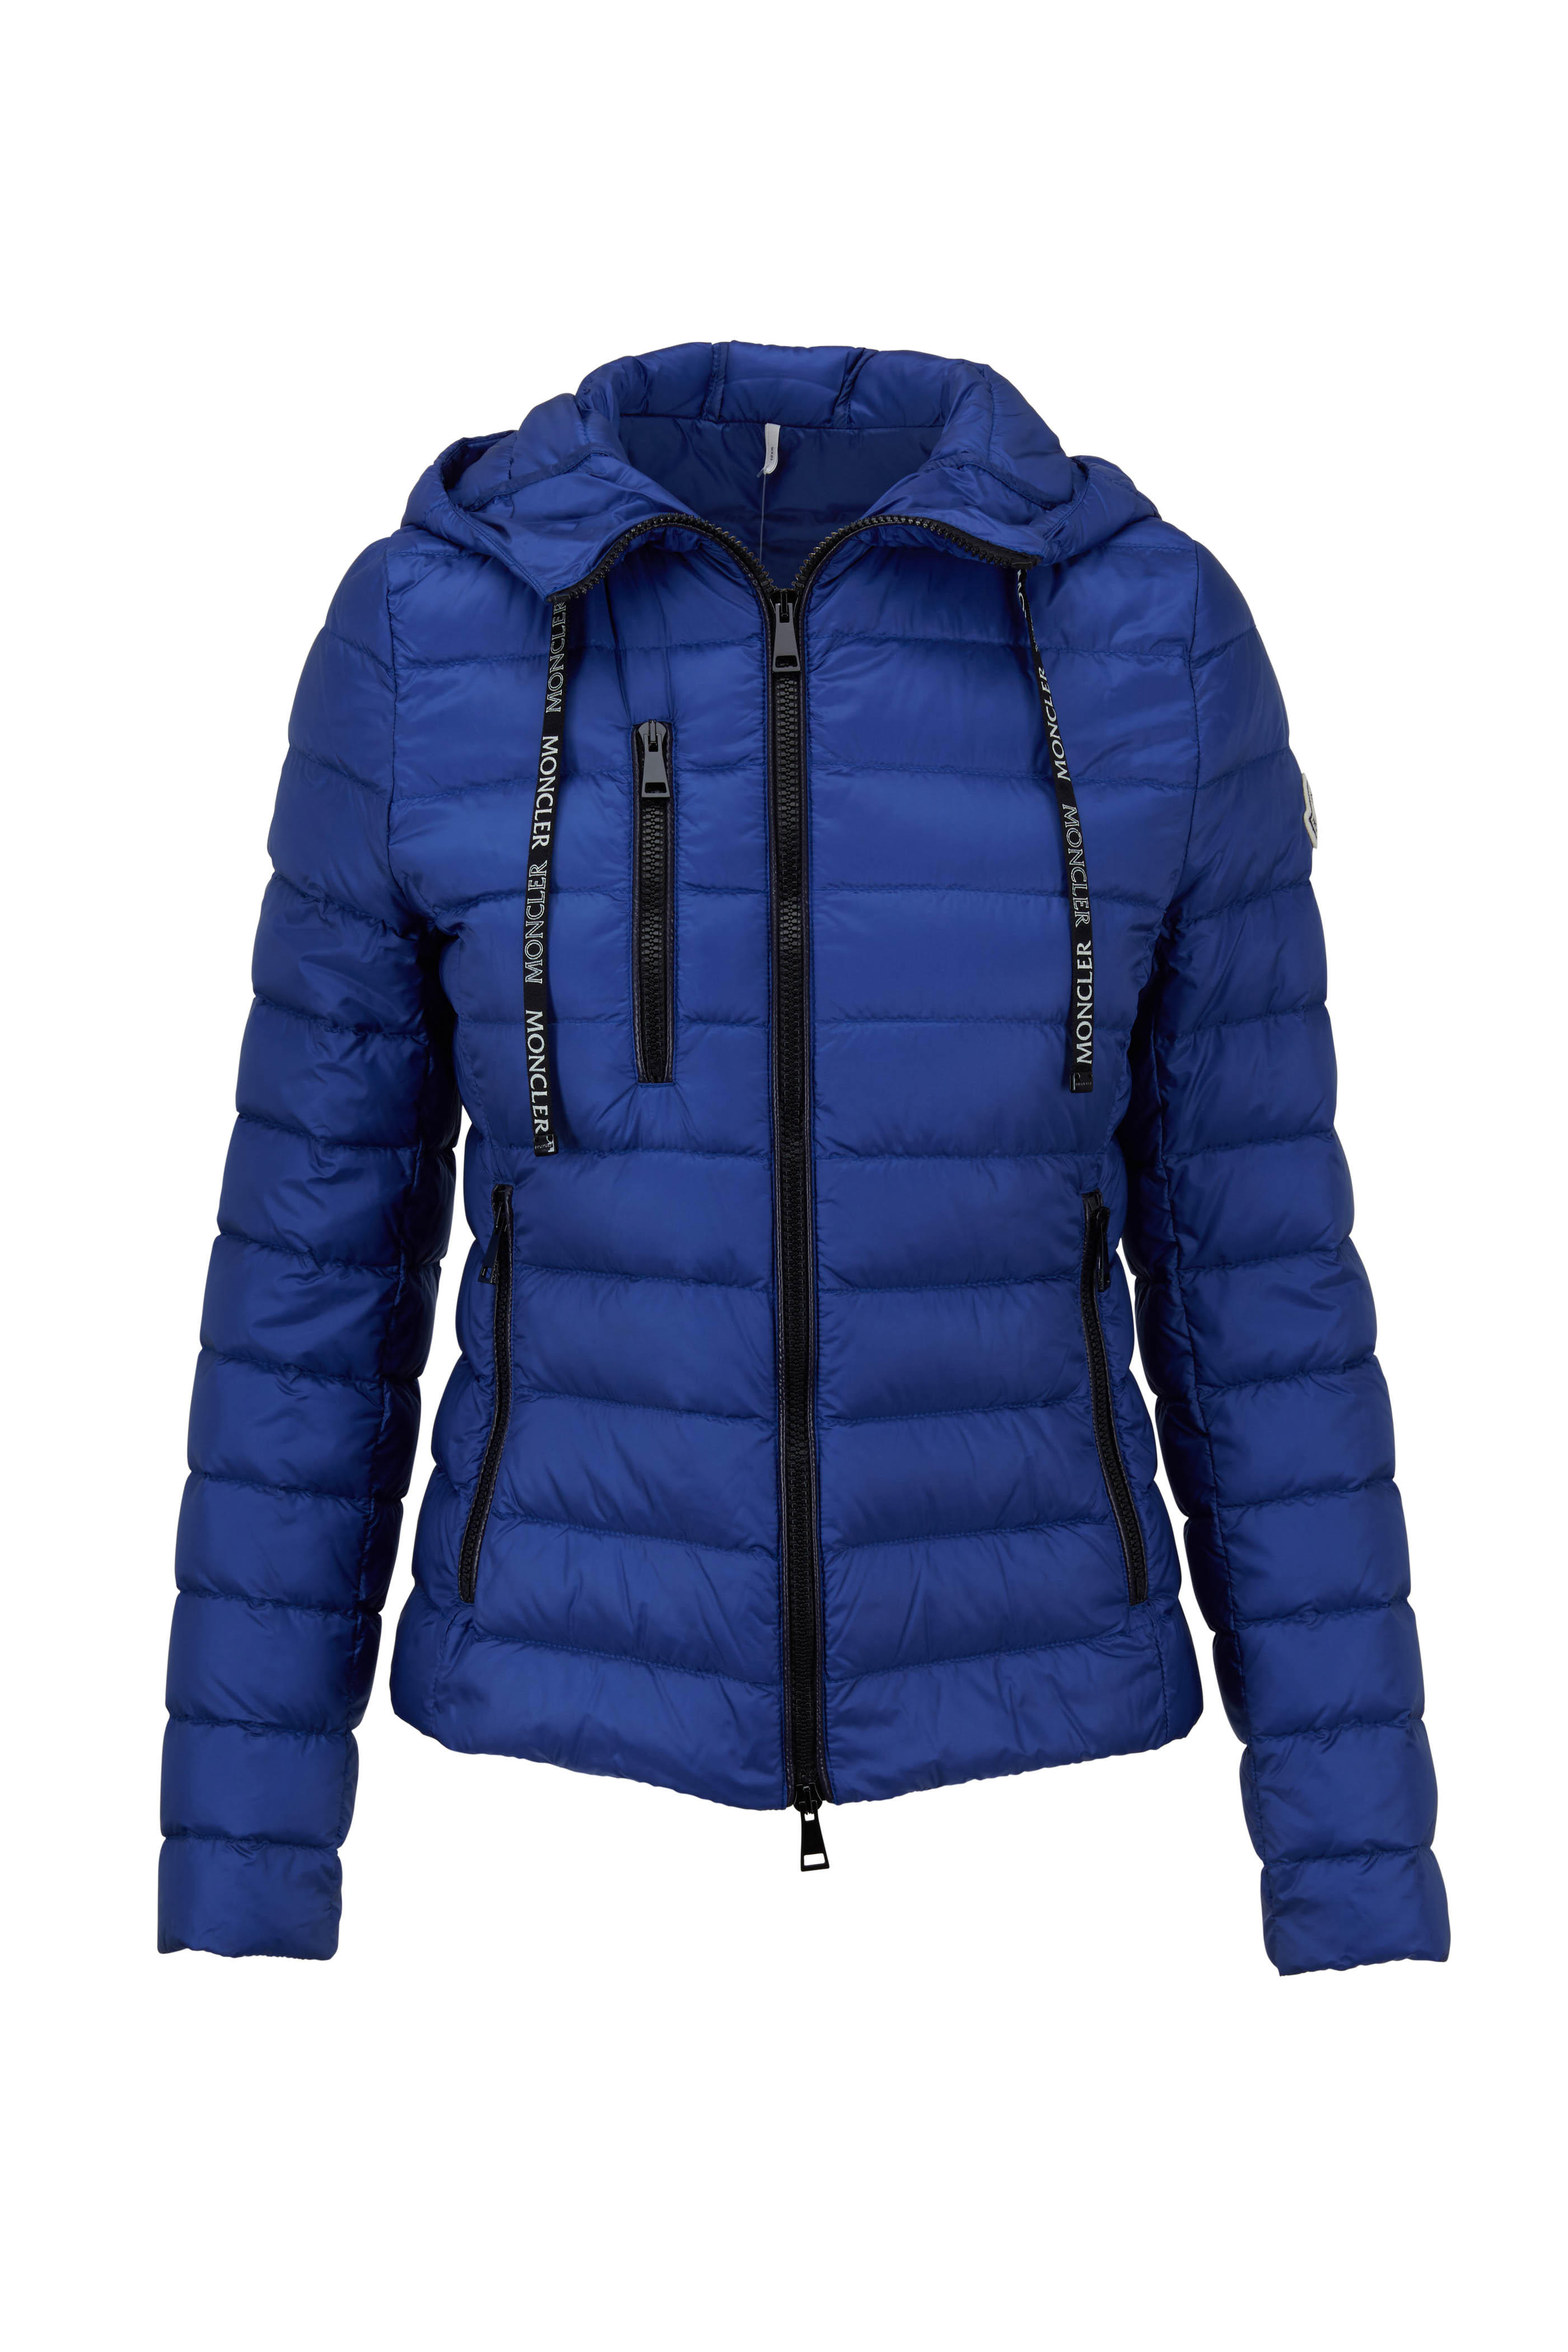 5d4fbdc43ce2 Moncler - Seoul Royal Blue Puffer Jacket